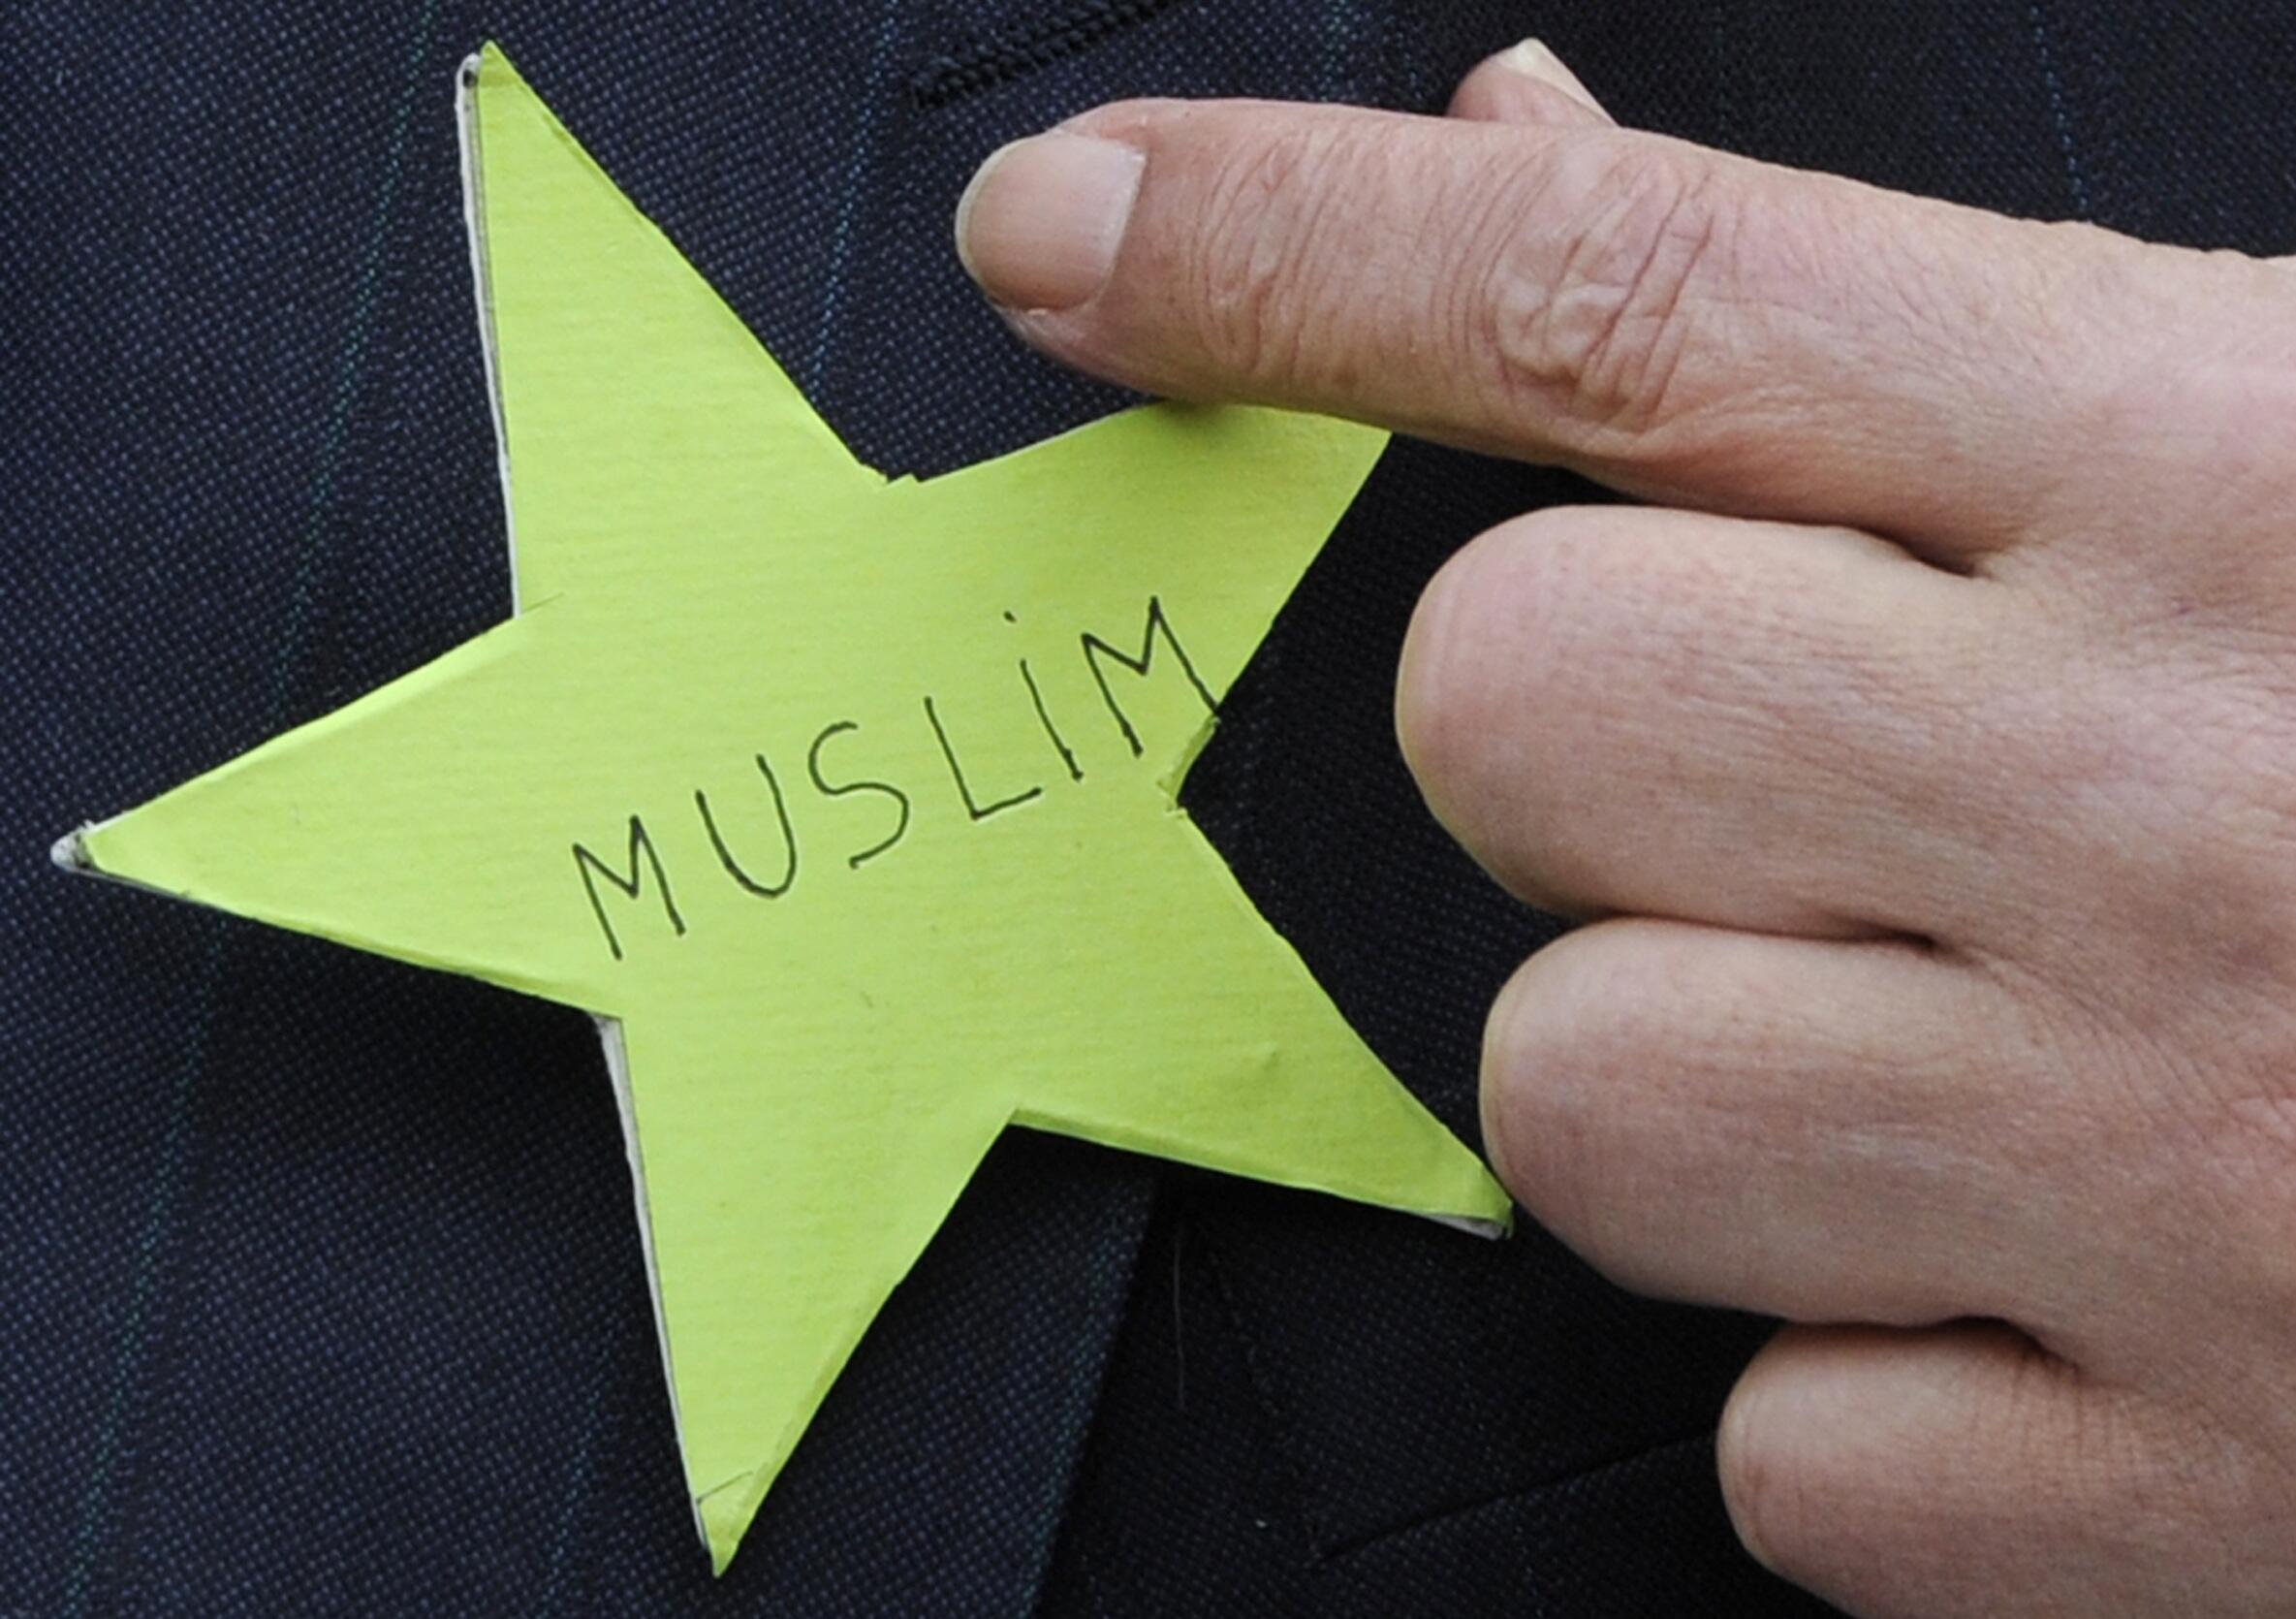 Former Sarkozy adviser Abderrahmane Dahmane with a green star, recalling anti-Semitism, in protest at the secularism debate